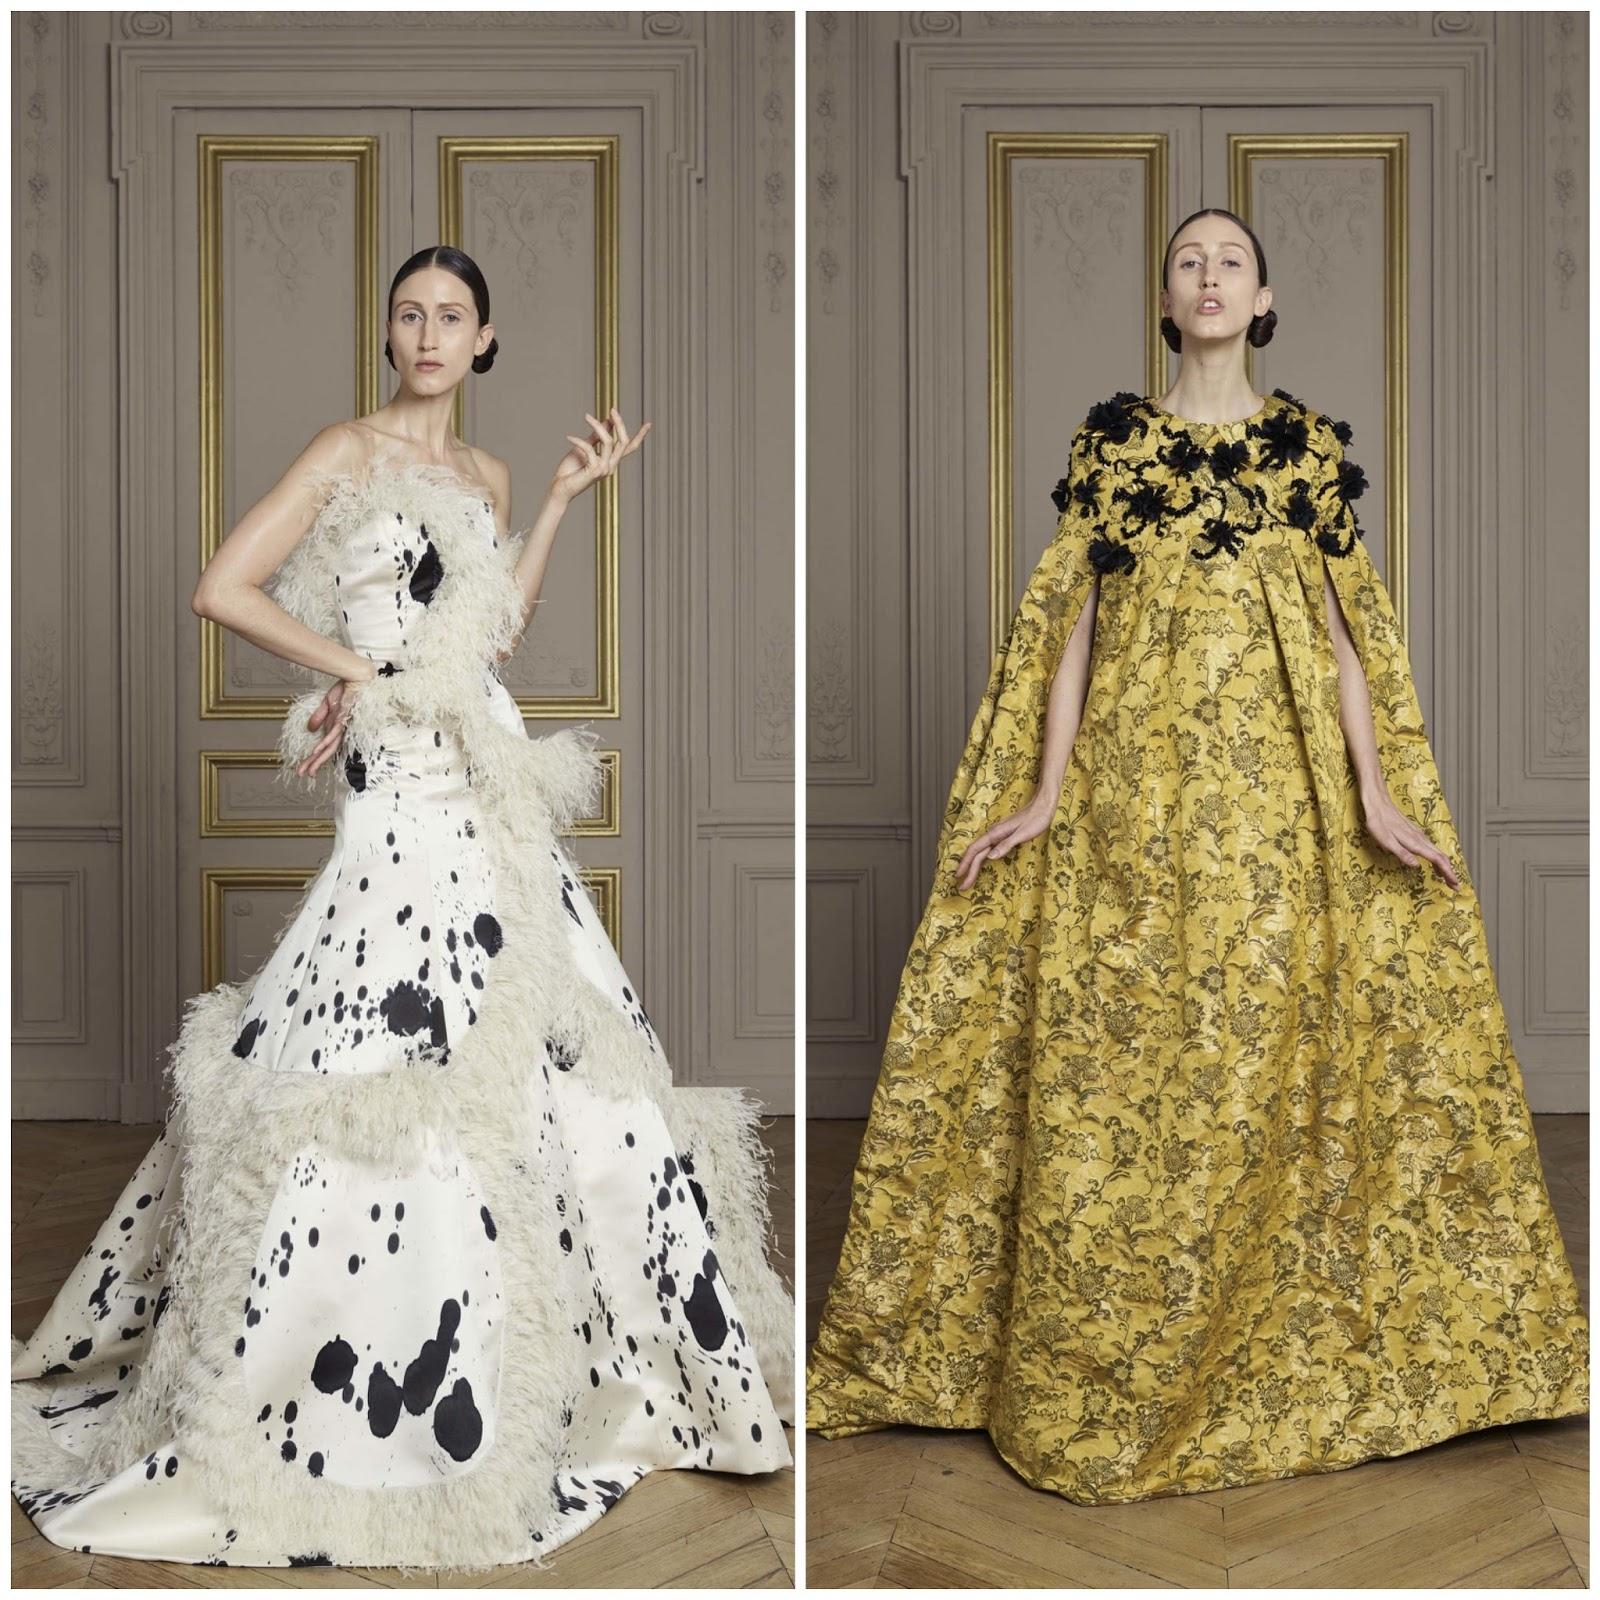 Wedding Gowns Cleveland Ohio: Nick Verreos's Blog